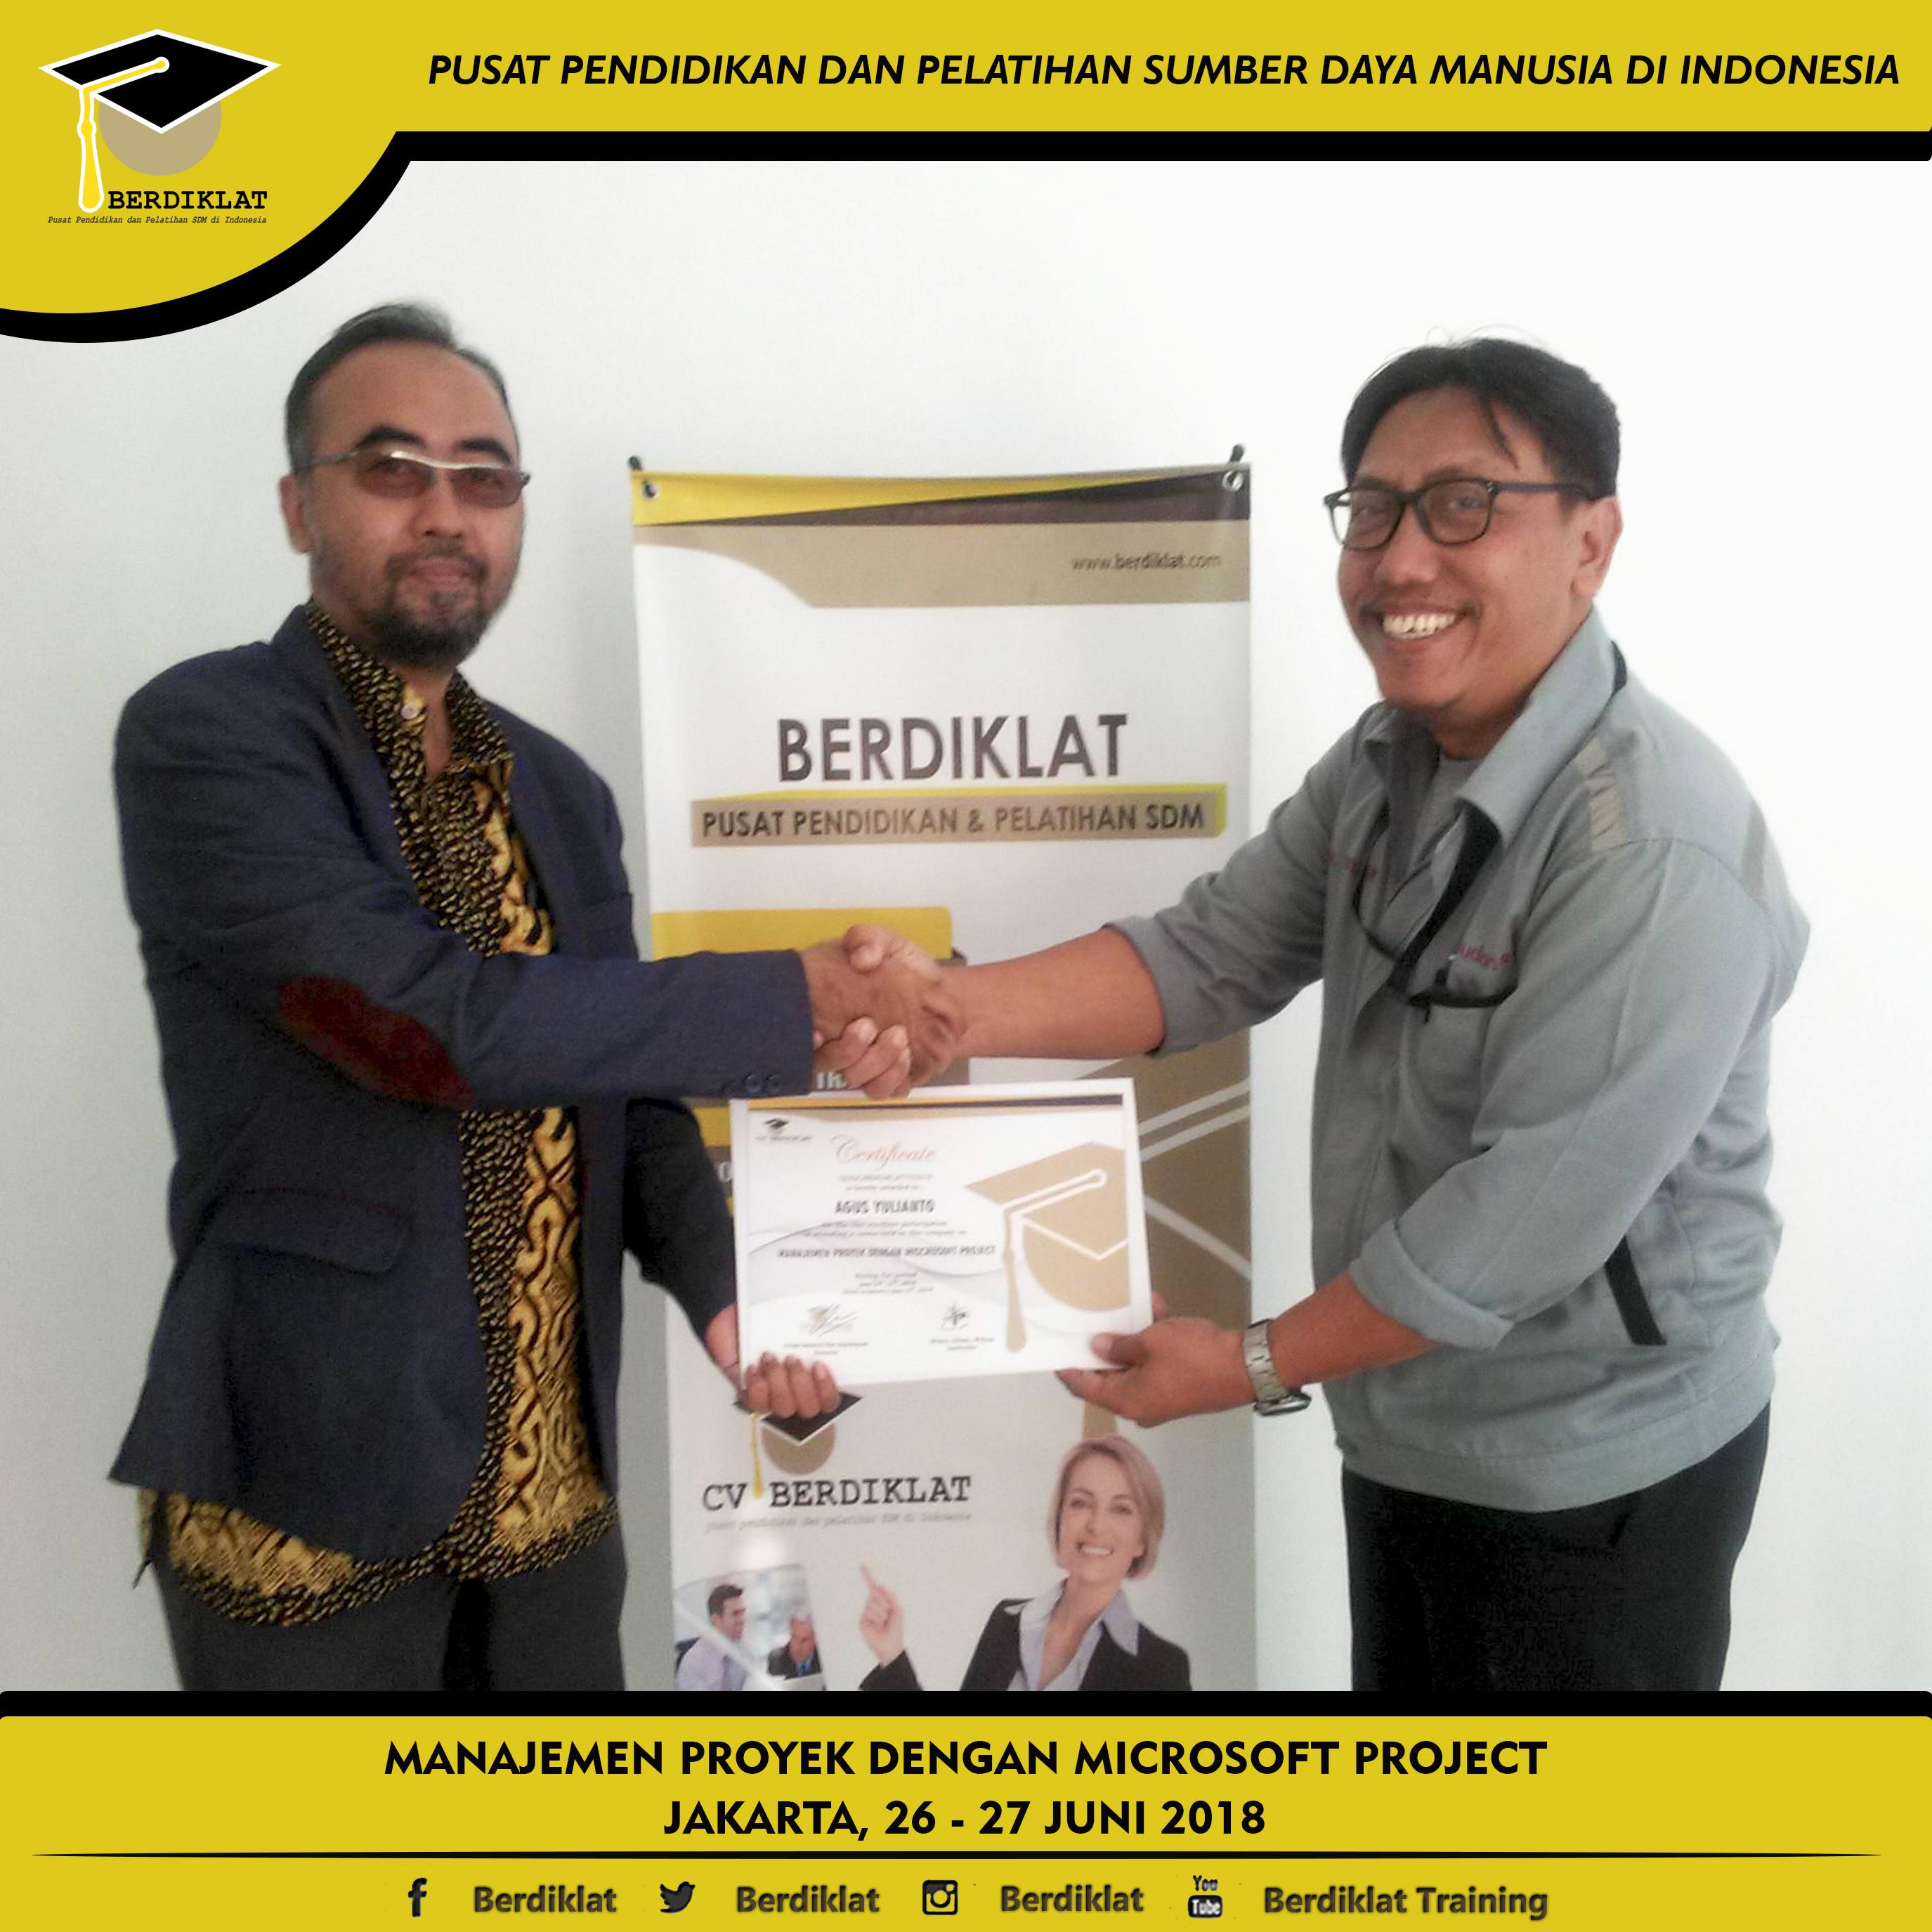 MANAJEMEN PROYEK DENGAN MICROSOFT PROJECT Jakarta, 26 - 27 Juni 2018 Berdiklat sd